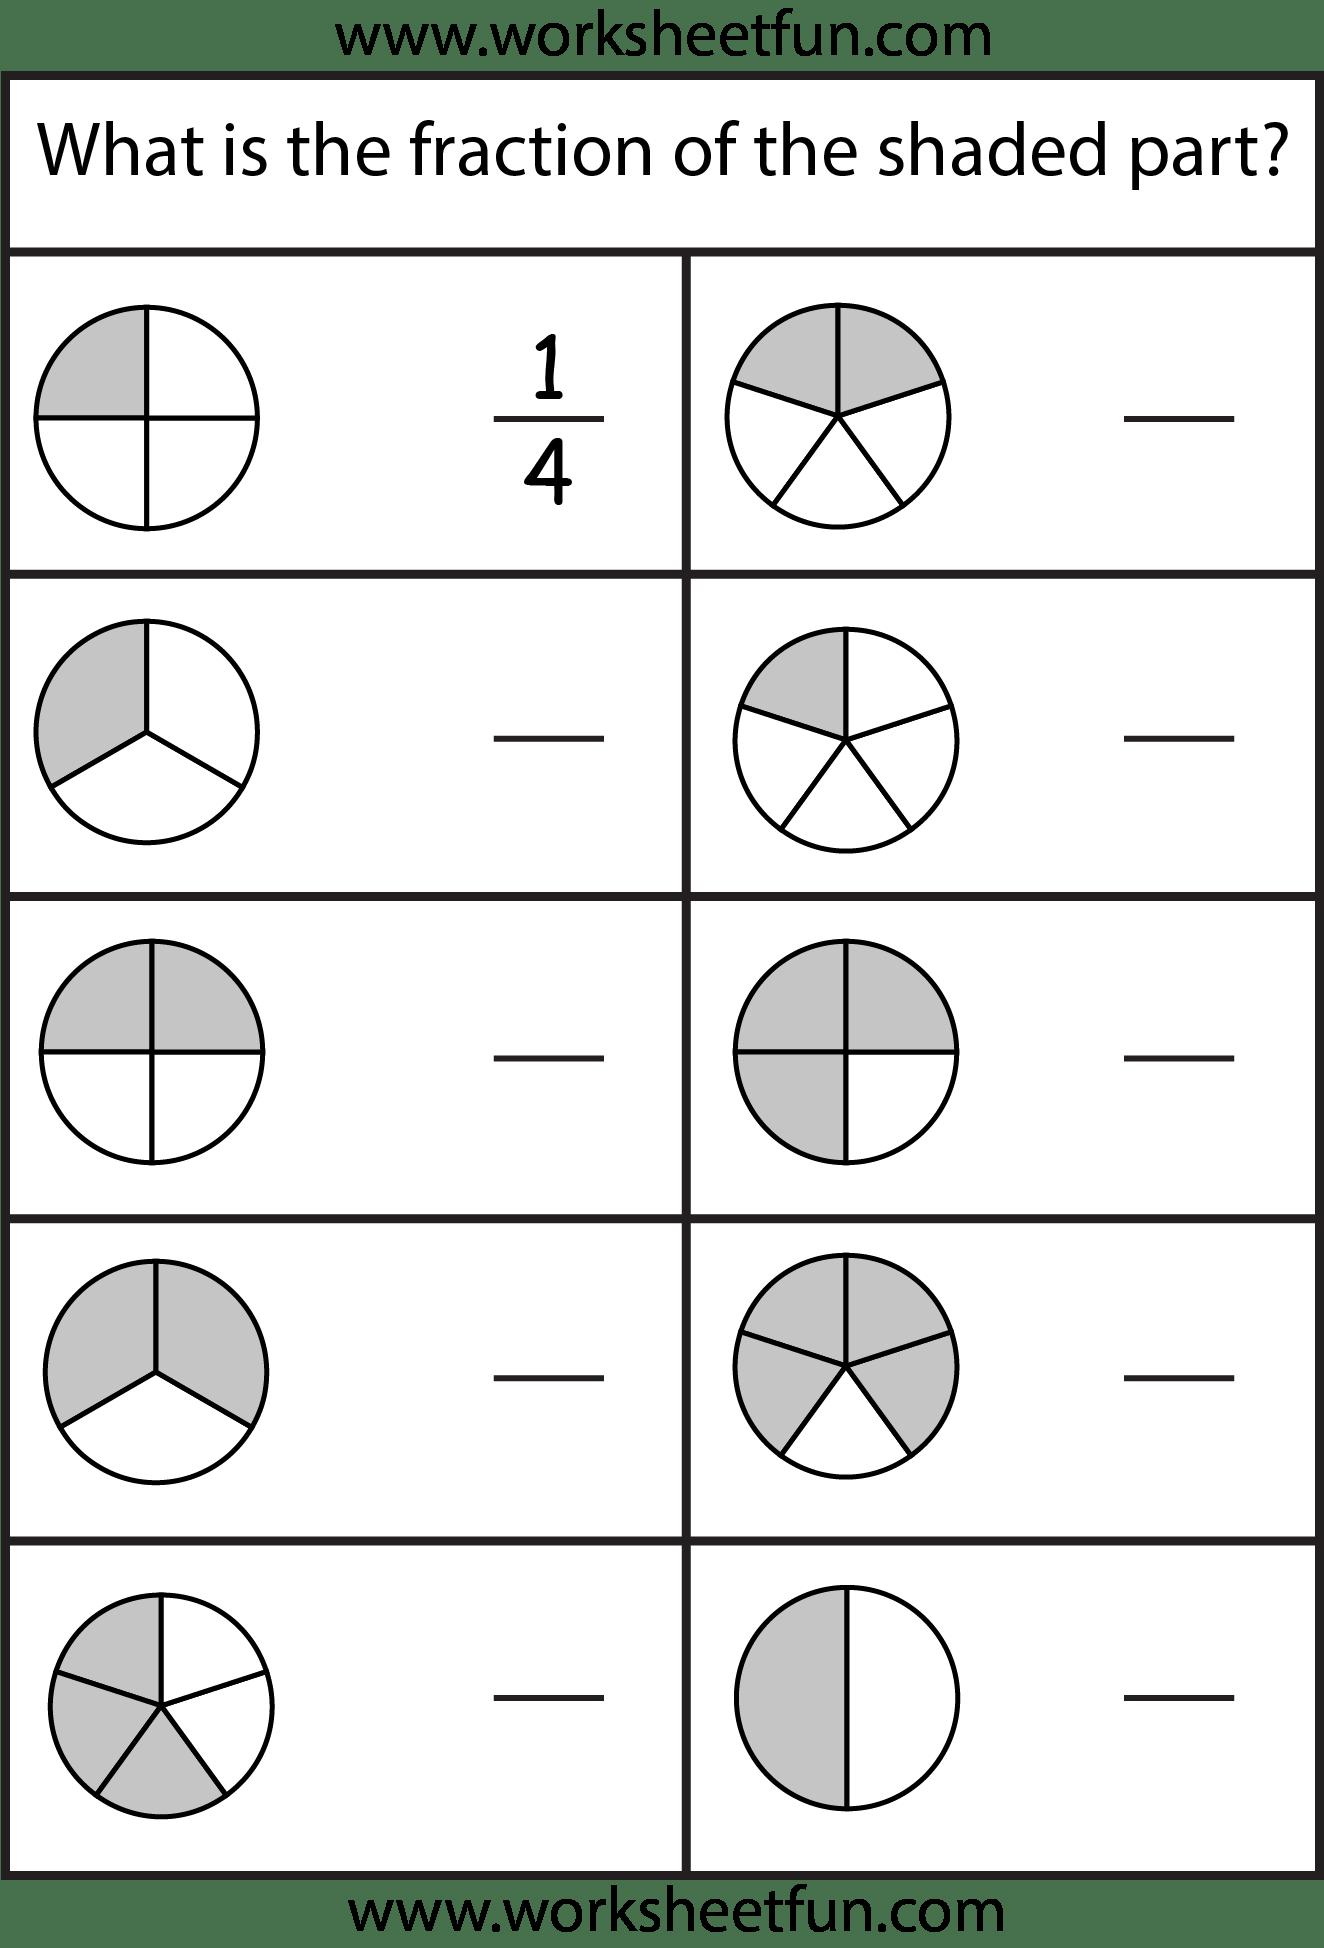 21 Best Beginning Fraction Worksheets To Print Images On